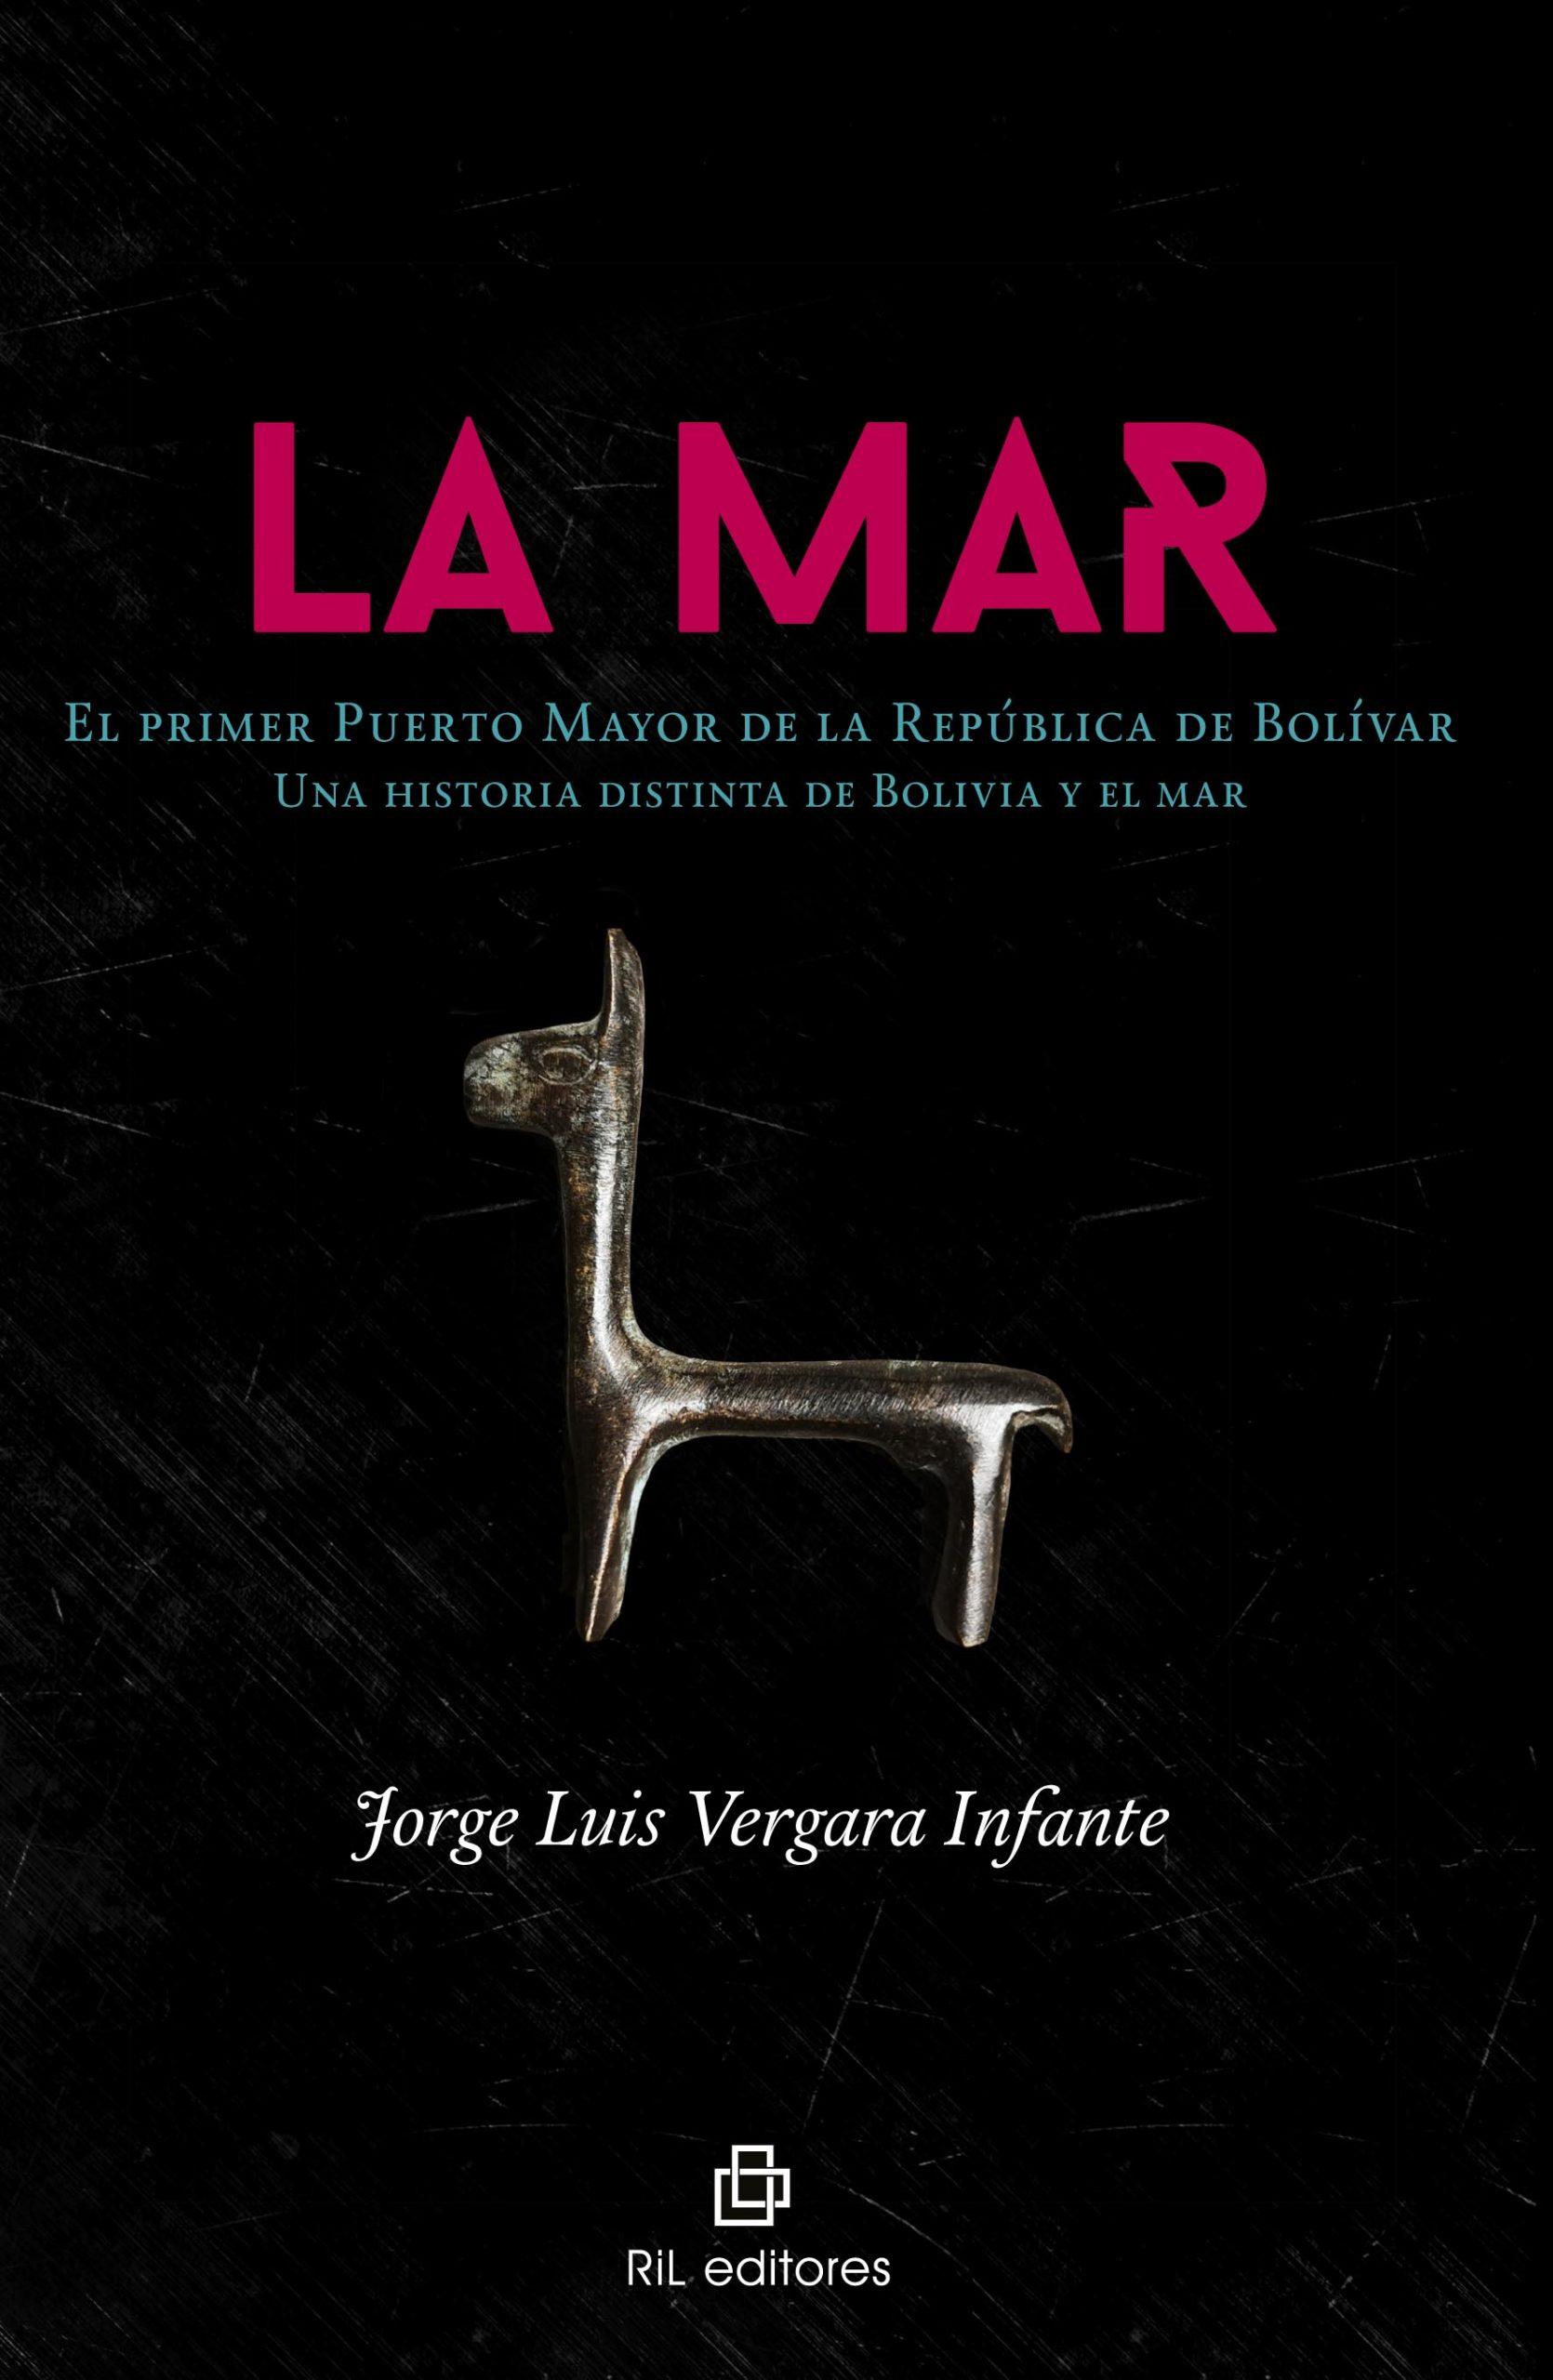 9788418065651-Vergara-Jorge-2021-La-Mar-1-scaled-1.jpg